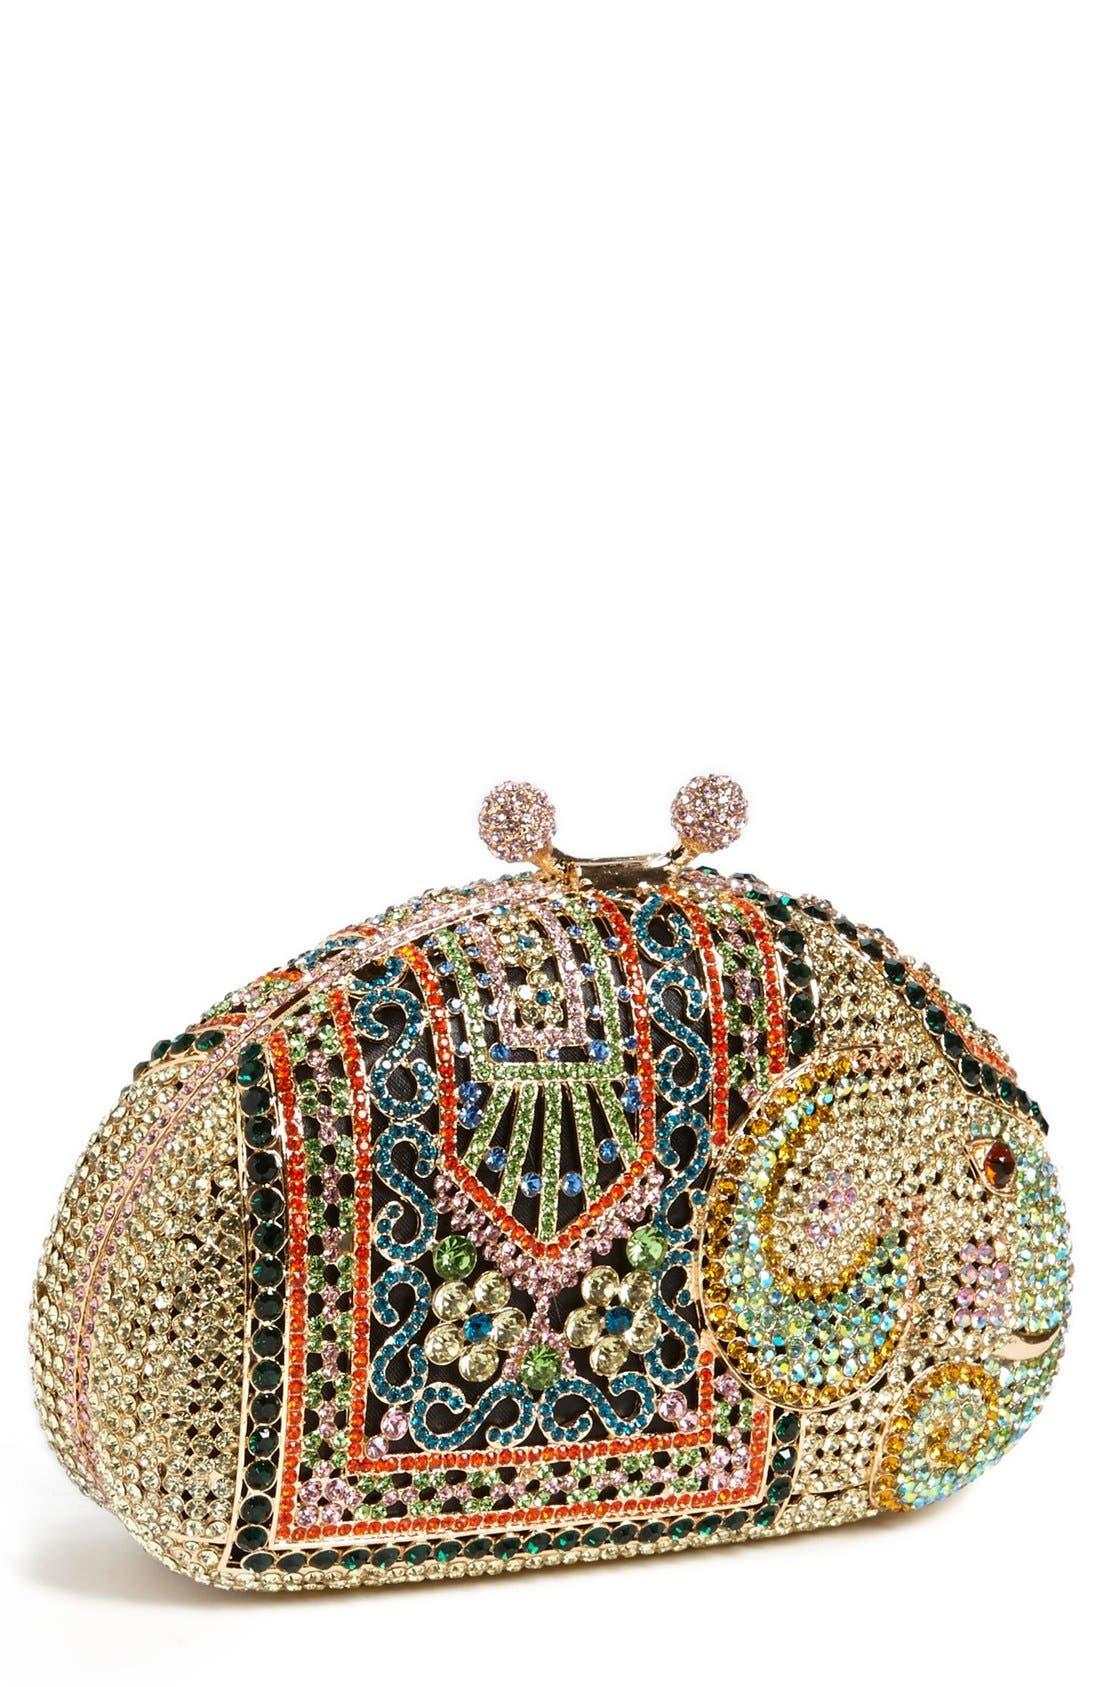 Alternate Image 1 Selected - Natasha Couture 'Elephant' Clutch